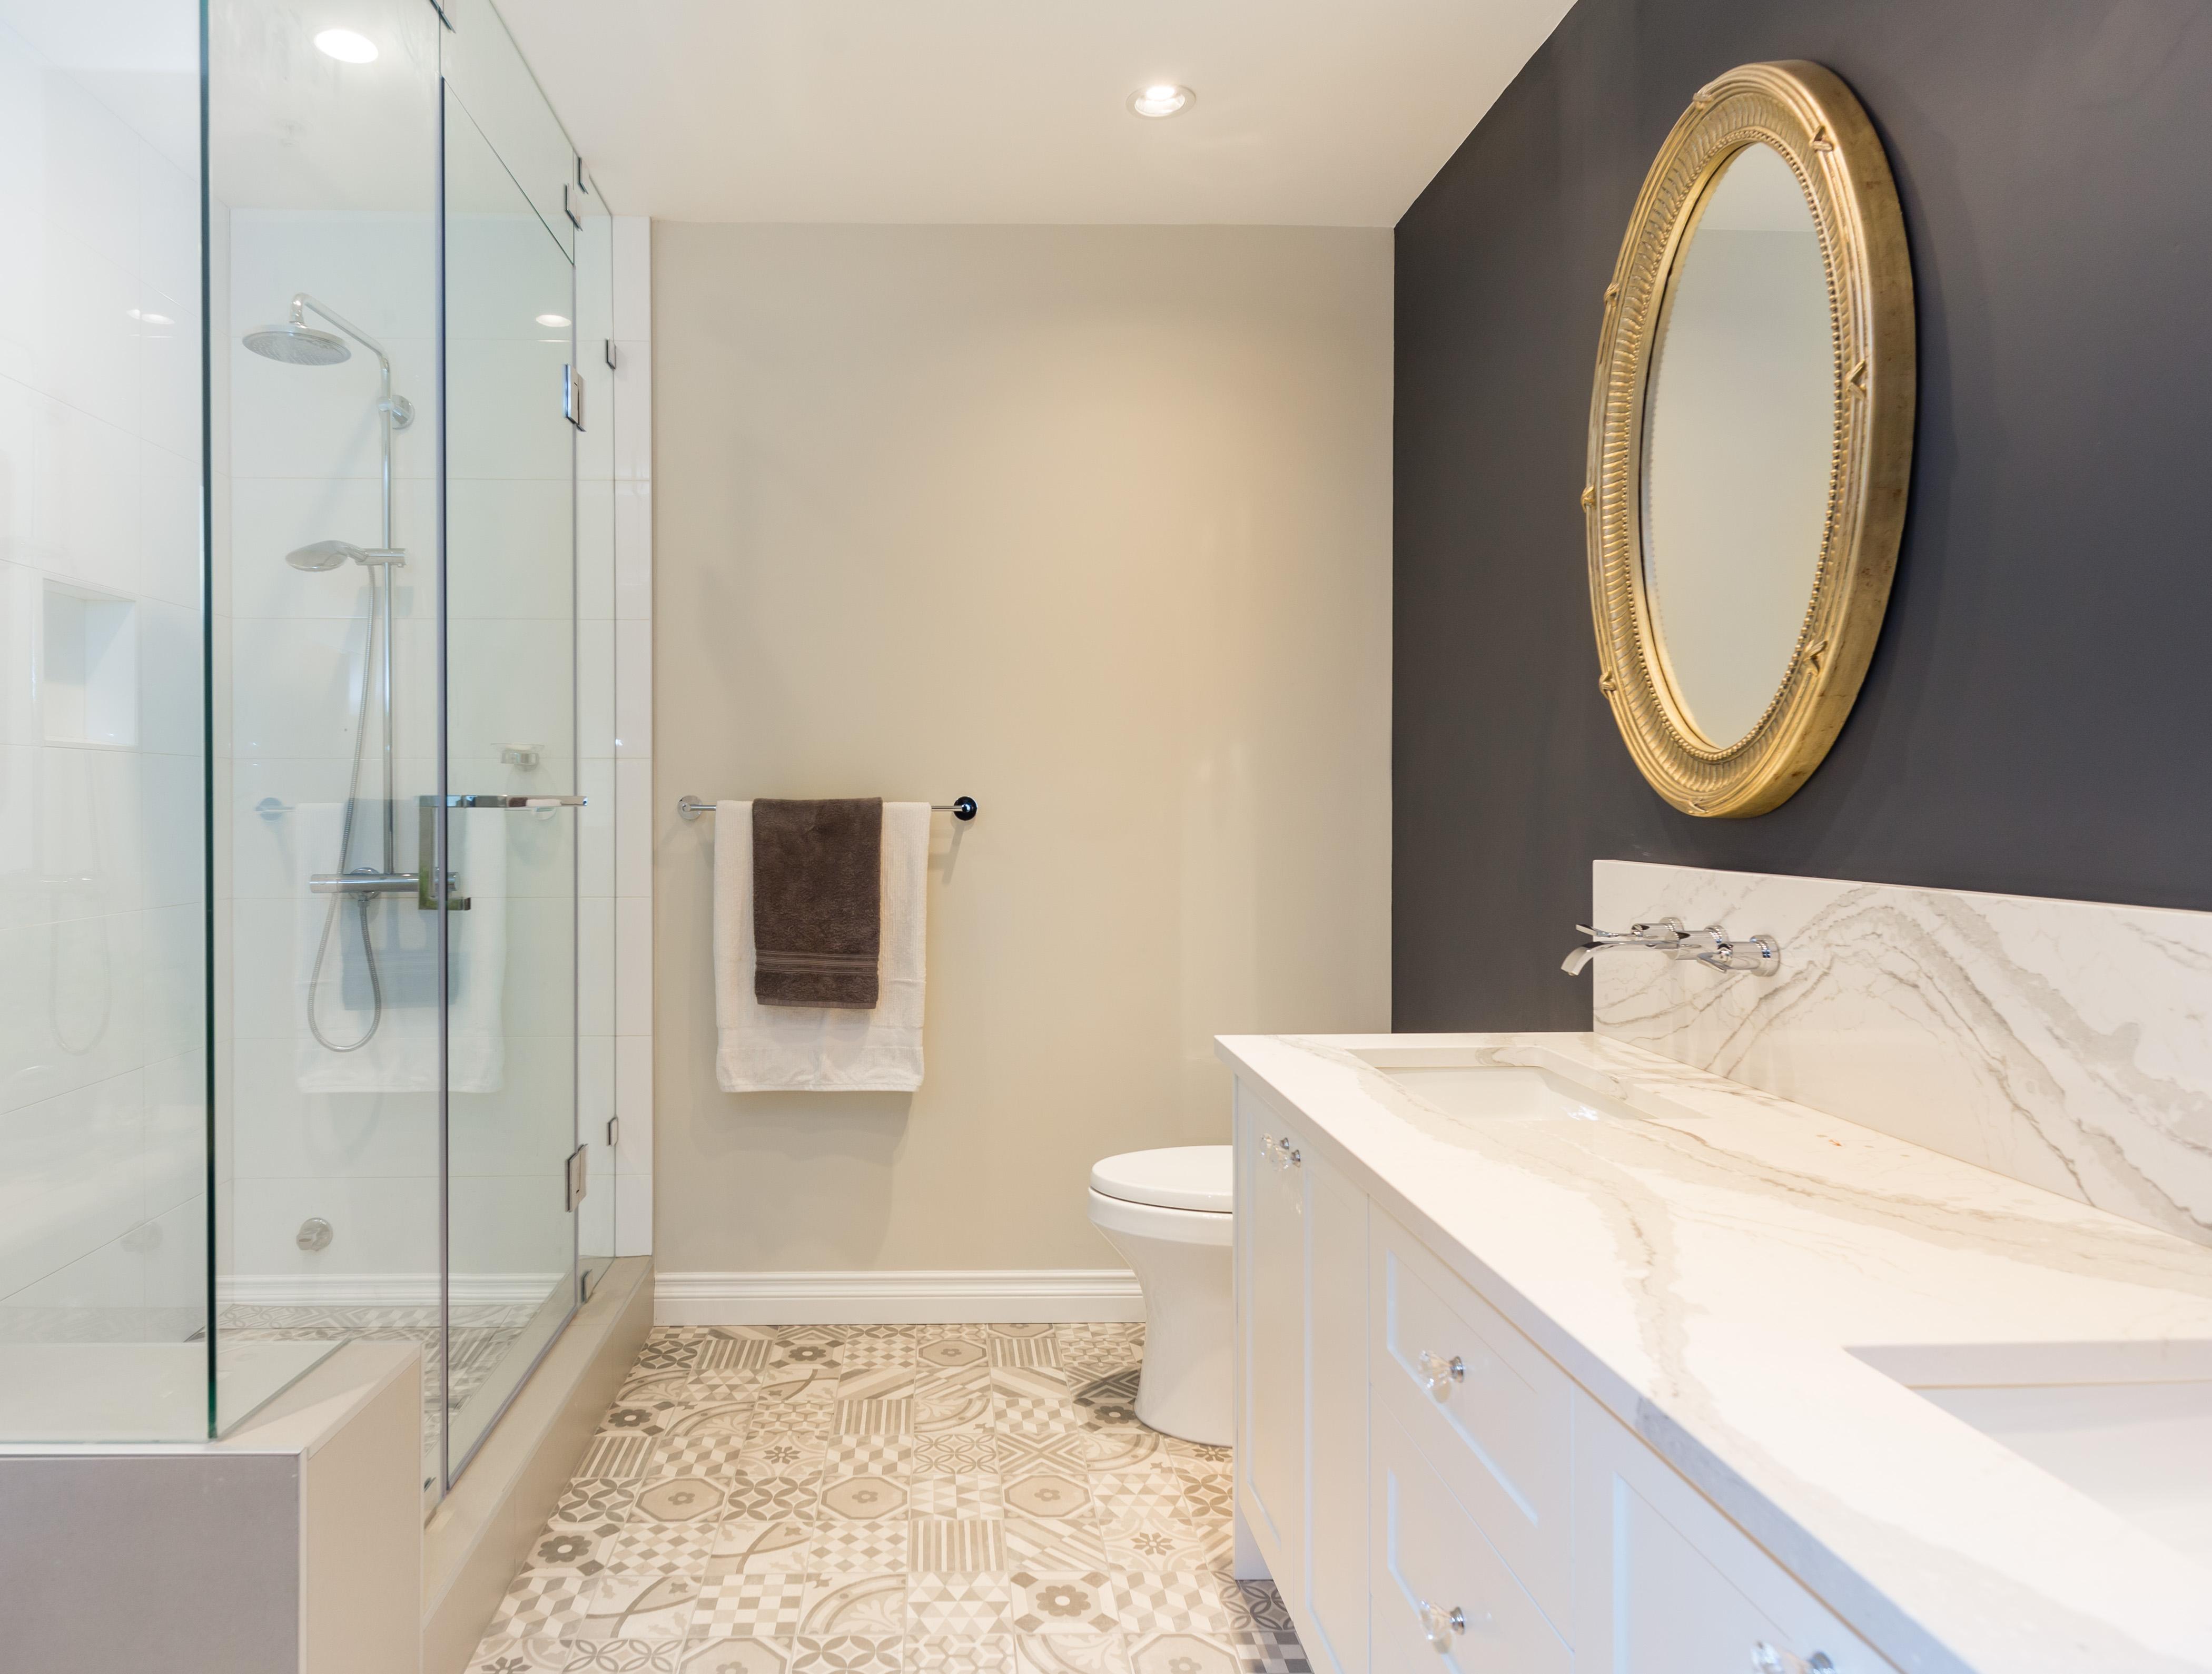 Castle Crescent Home Kitchen And Bathroom Renovation